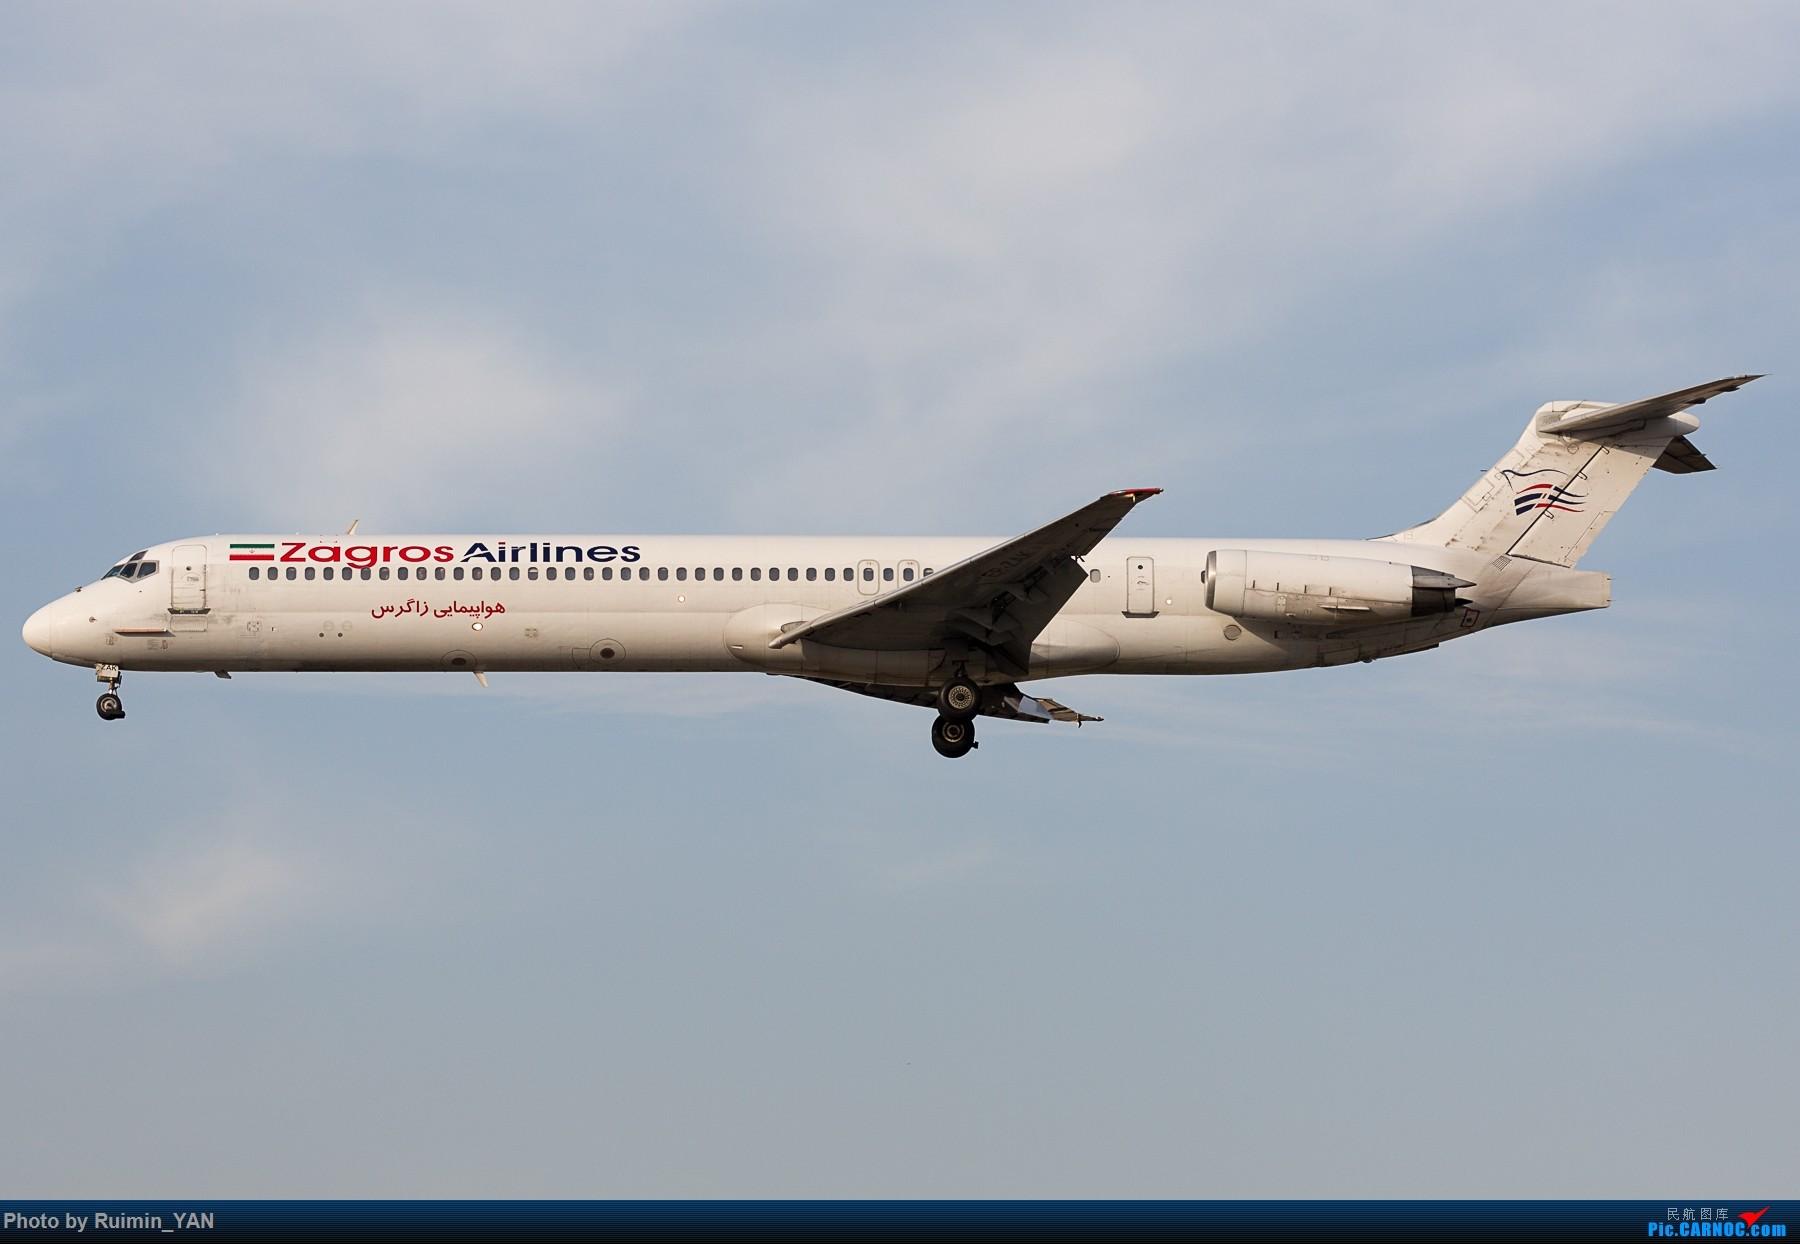 Re:[原创]【THR】(德黑兰梅赫拉巴德机场)伊朗Zagros航空(Zagros Air,IZG)--MD82 MD MD-80-83 EP-ZAK 伊朗德黑兰机场